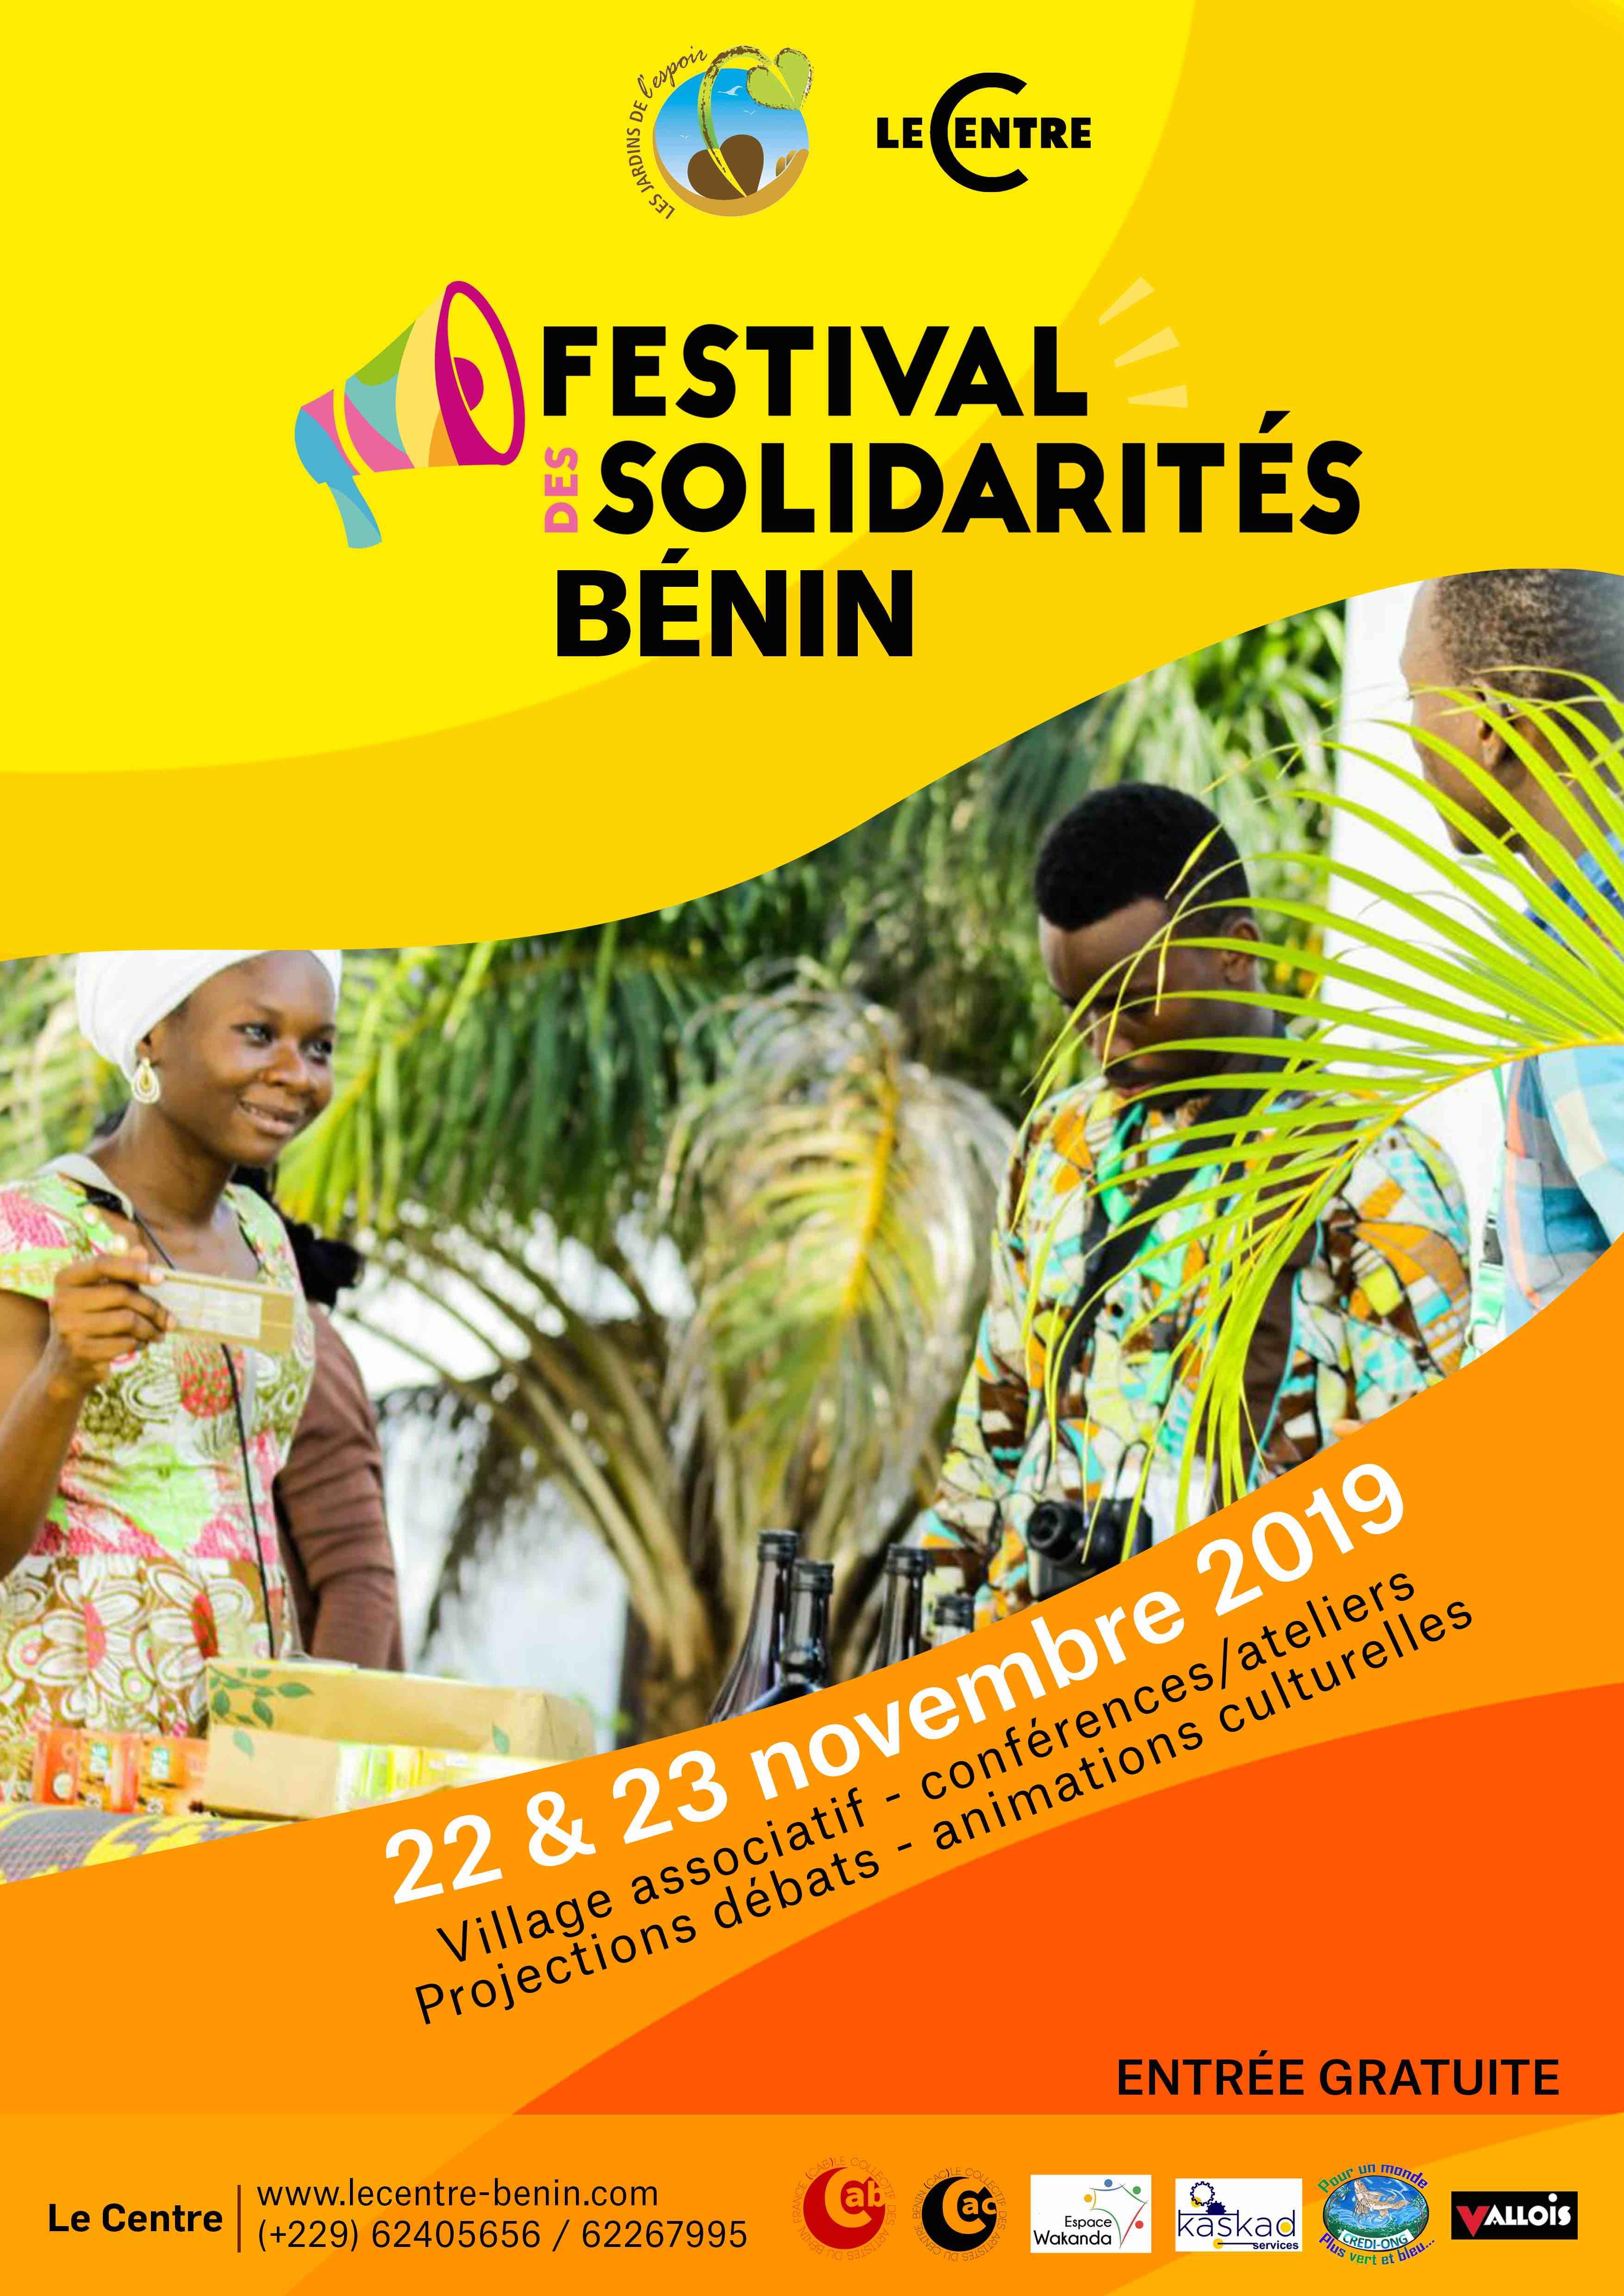 Festival Solidarités Bénin (Festisol)